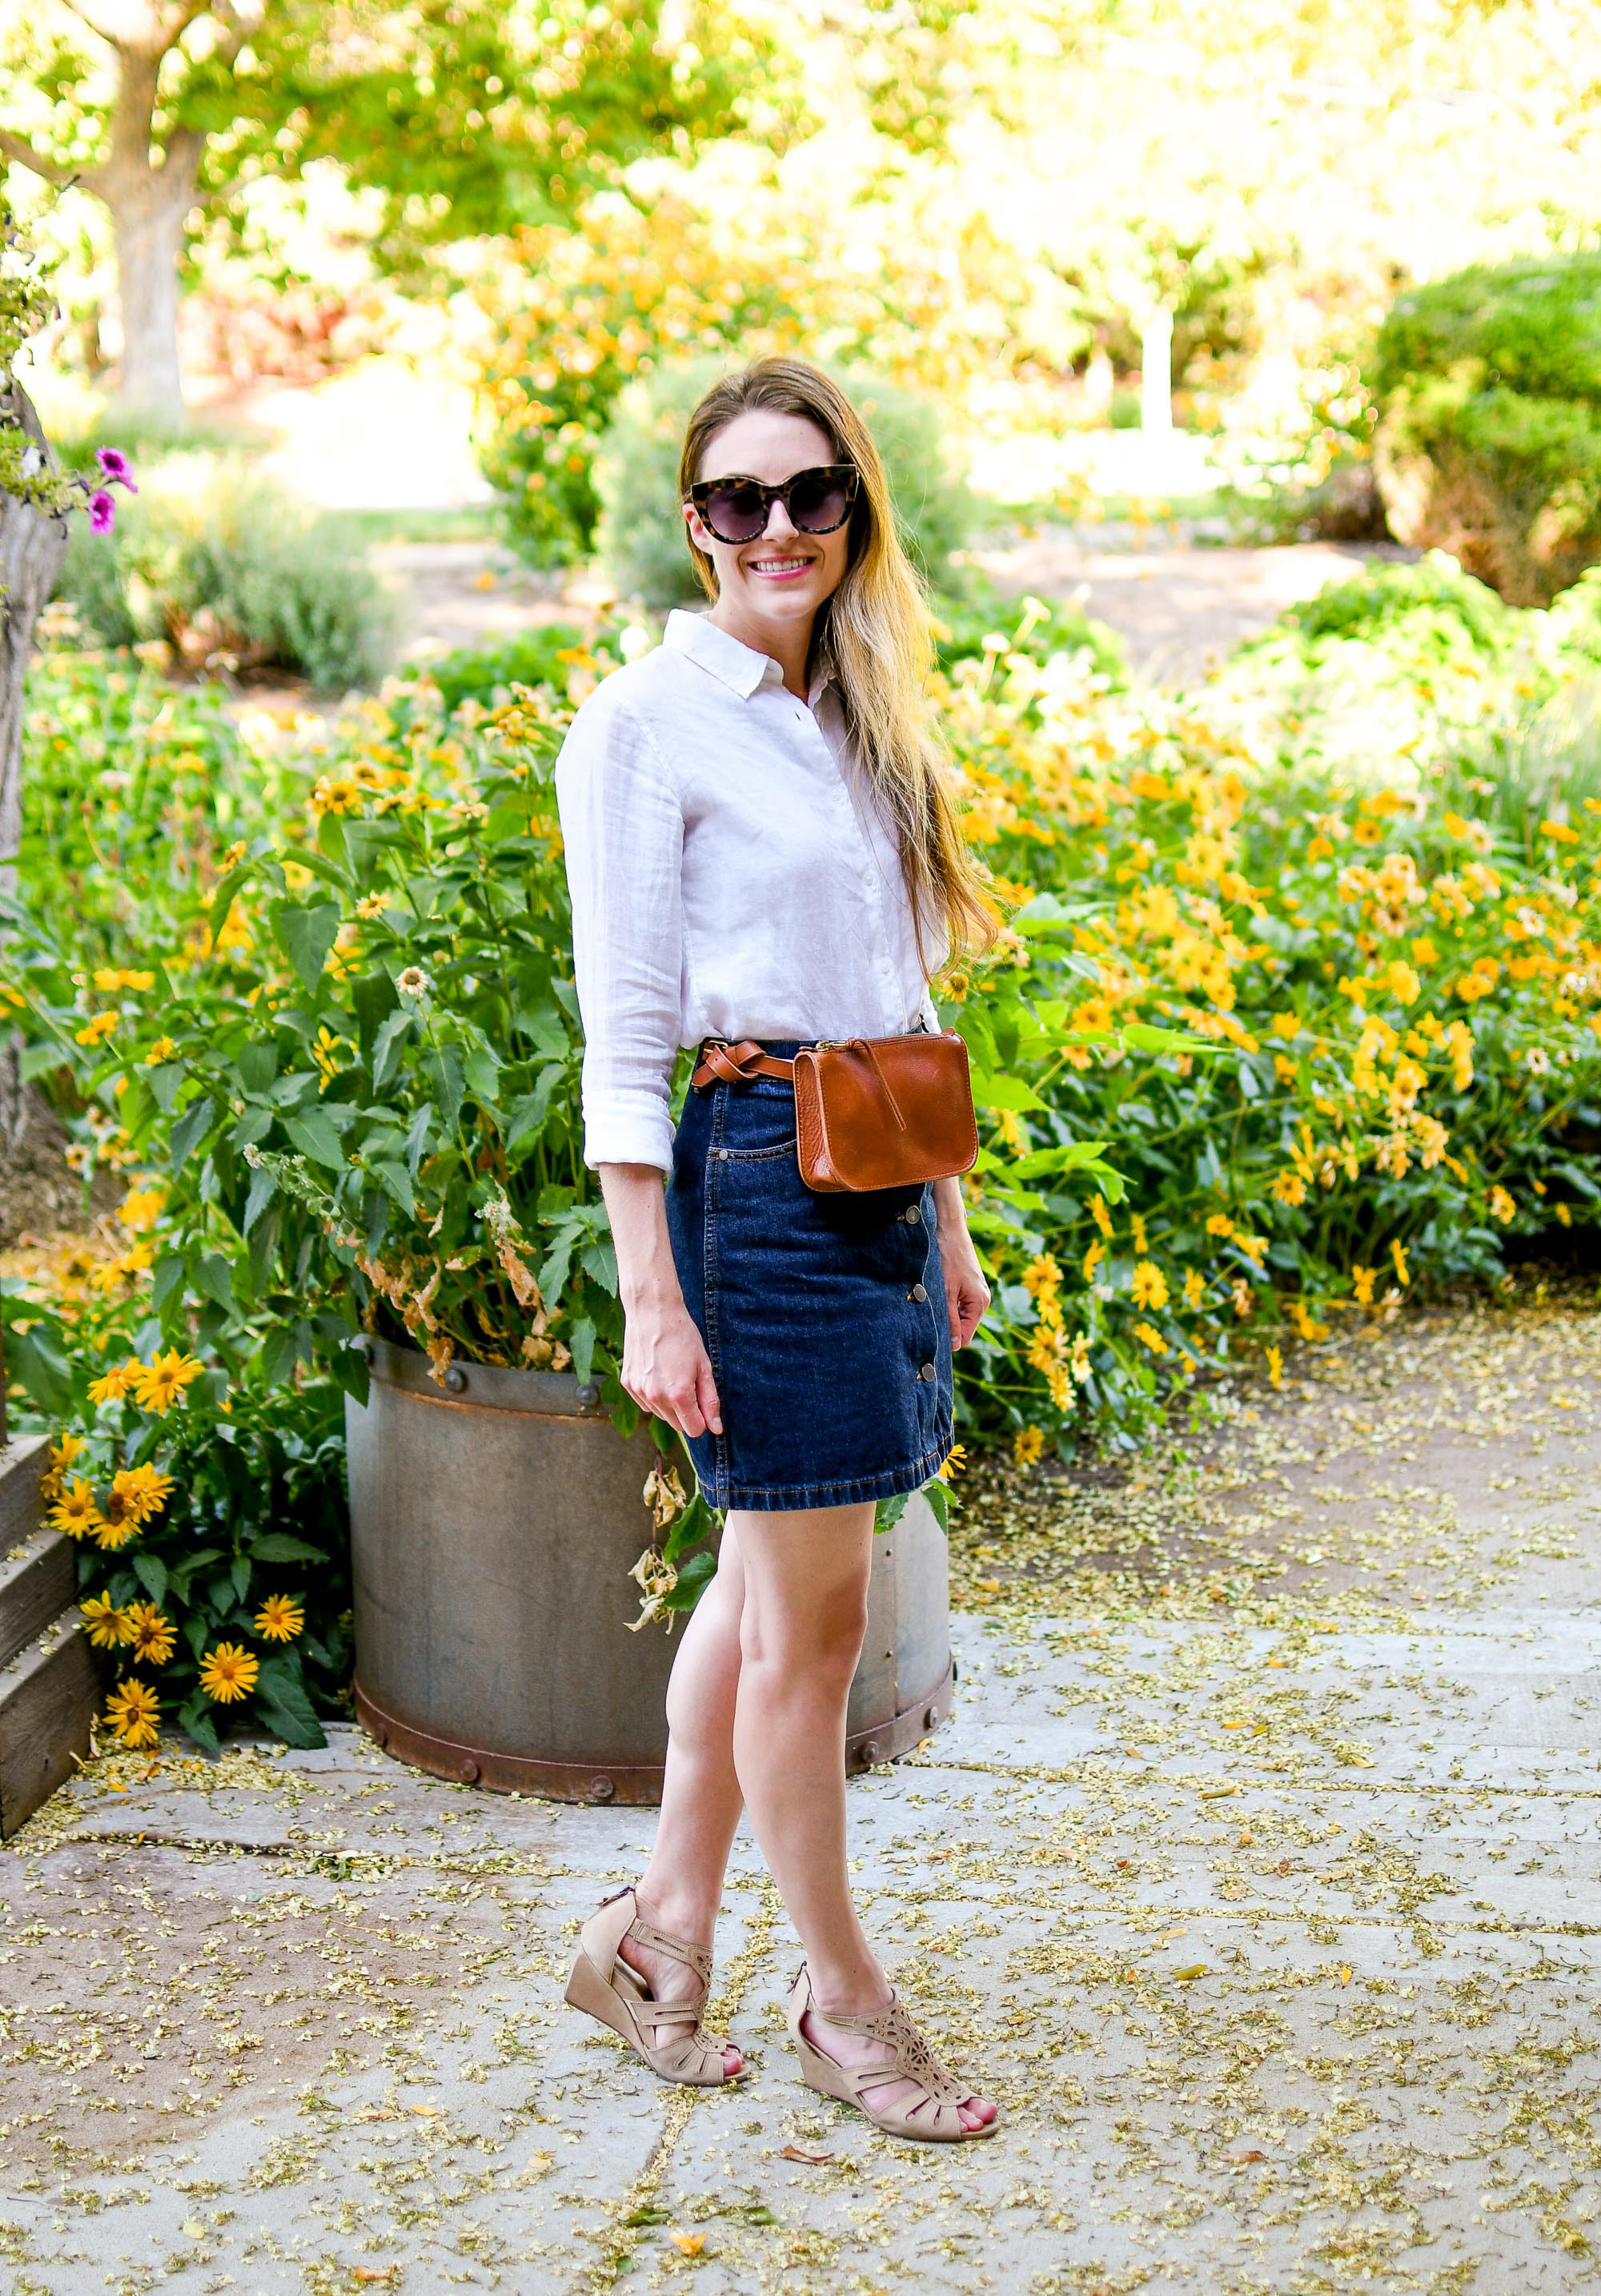 Casual summer outfit with white linen shirt, denim skirt, belt bag — Cotton Cashmere Cat Hair